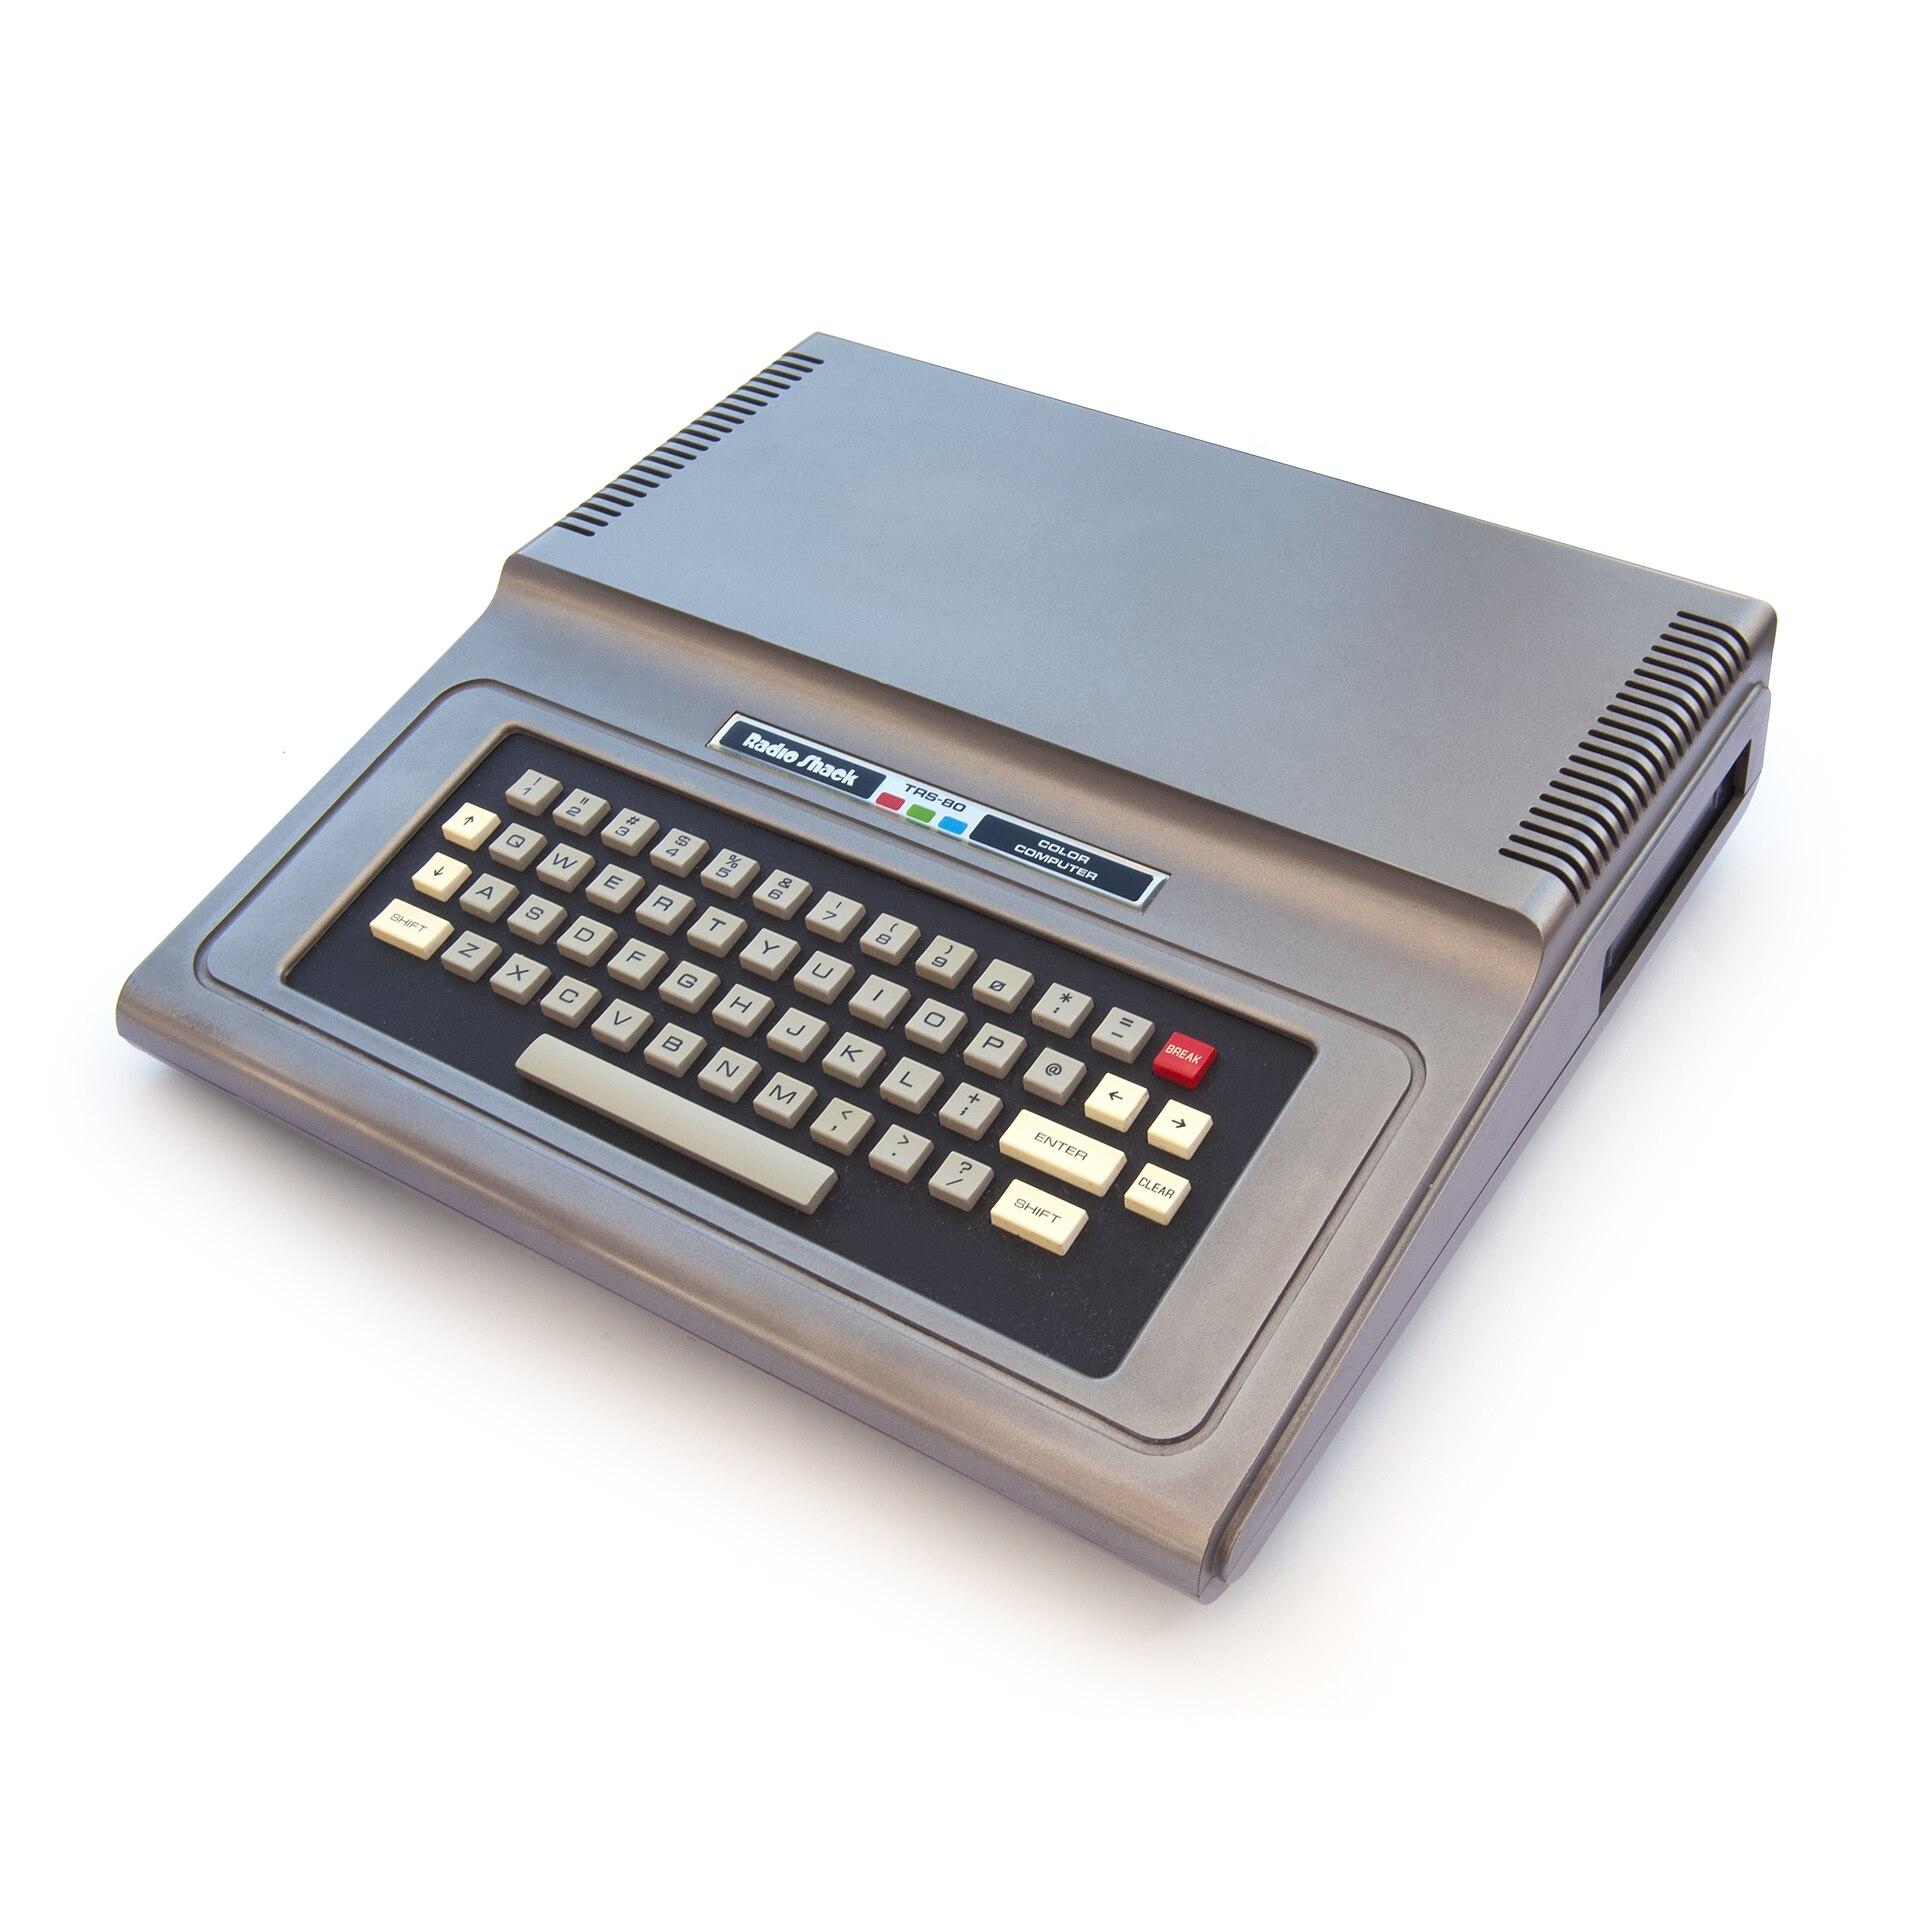 trs80 color computer wikipedia